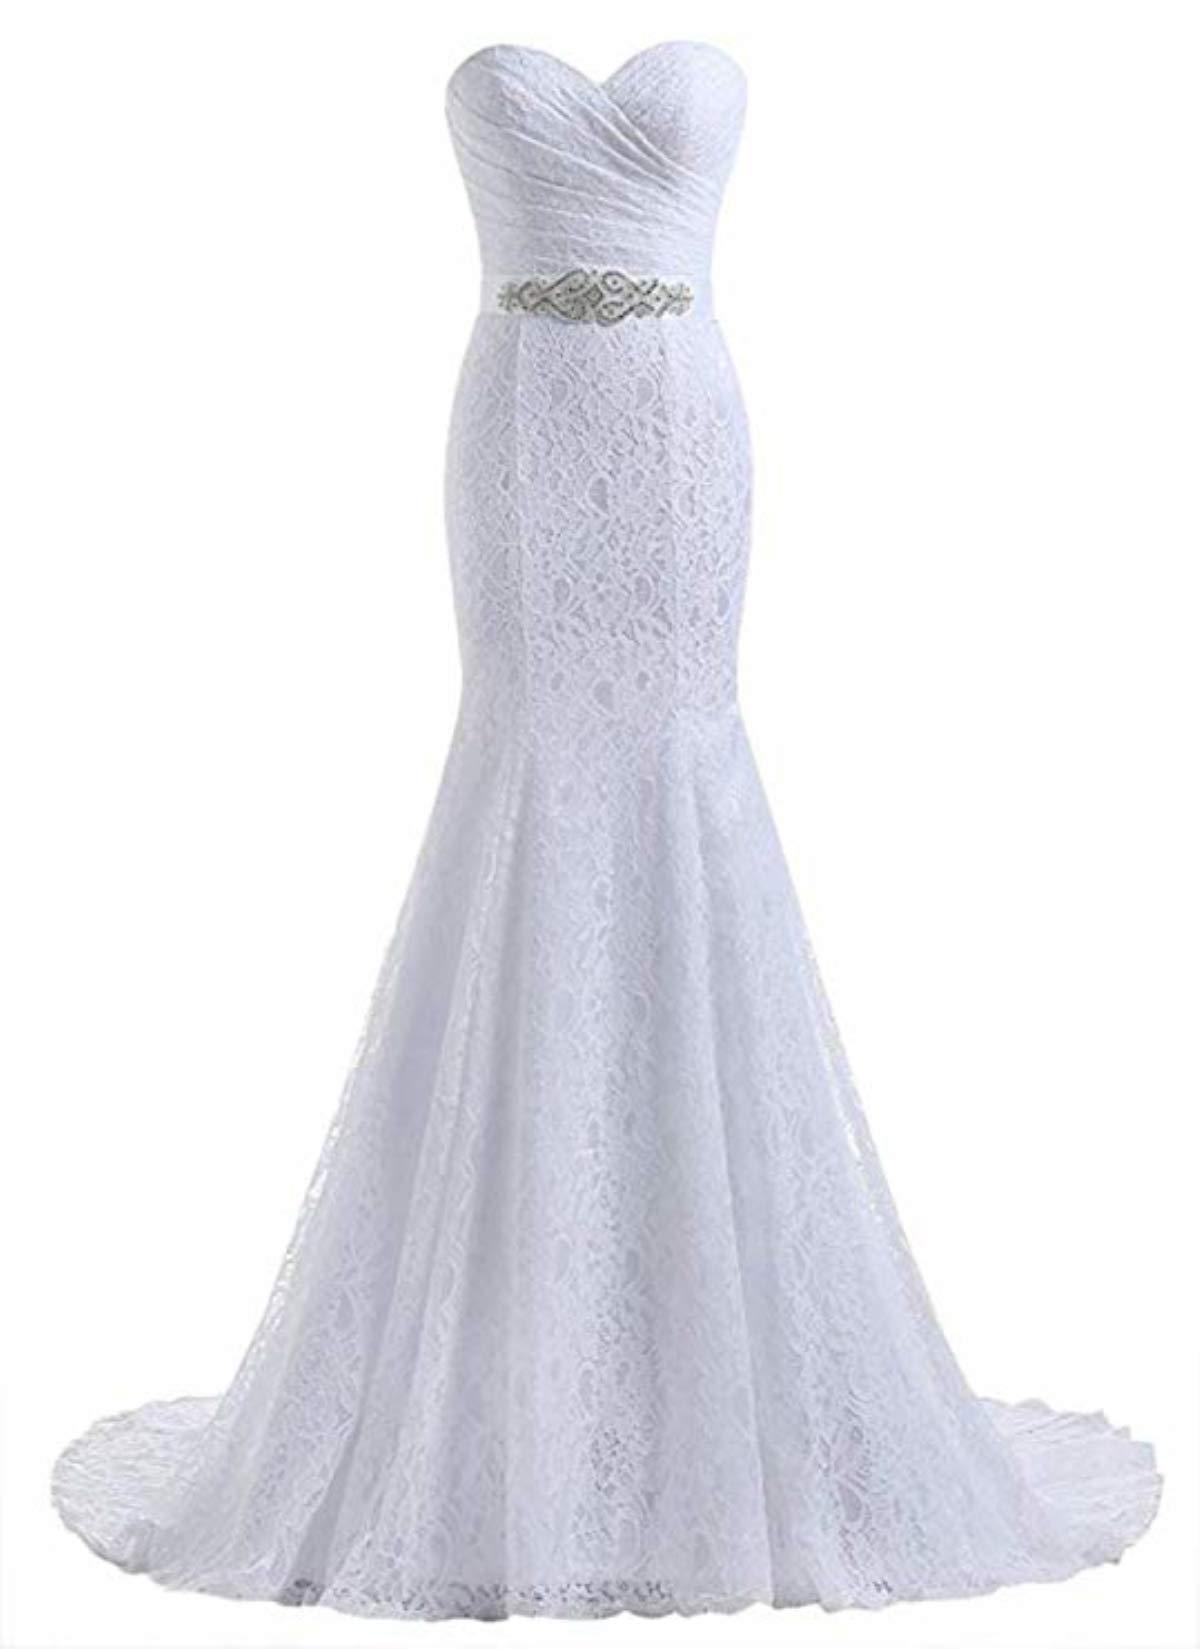 Likedpage Women's Lace Mermaid Bridal Wedding Dresses product image